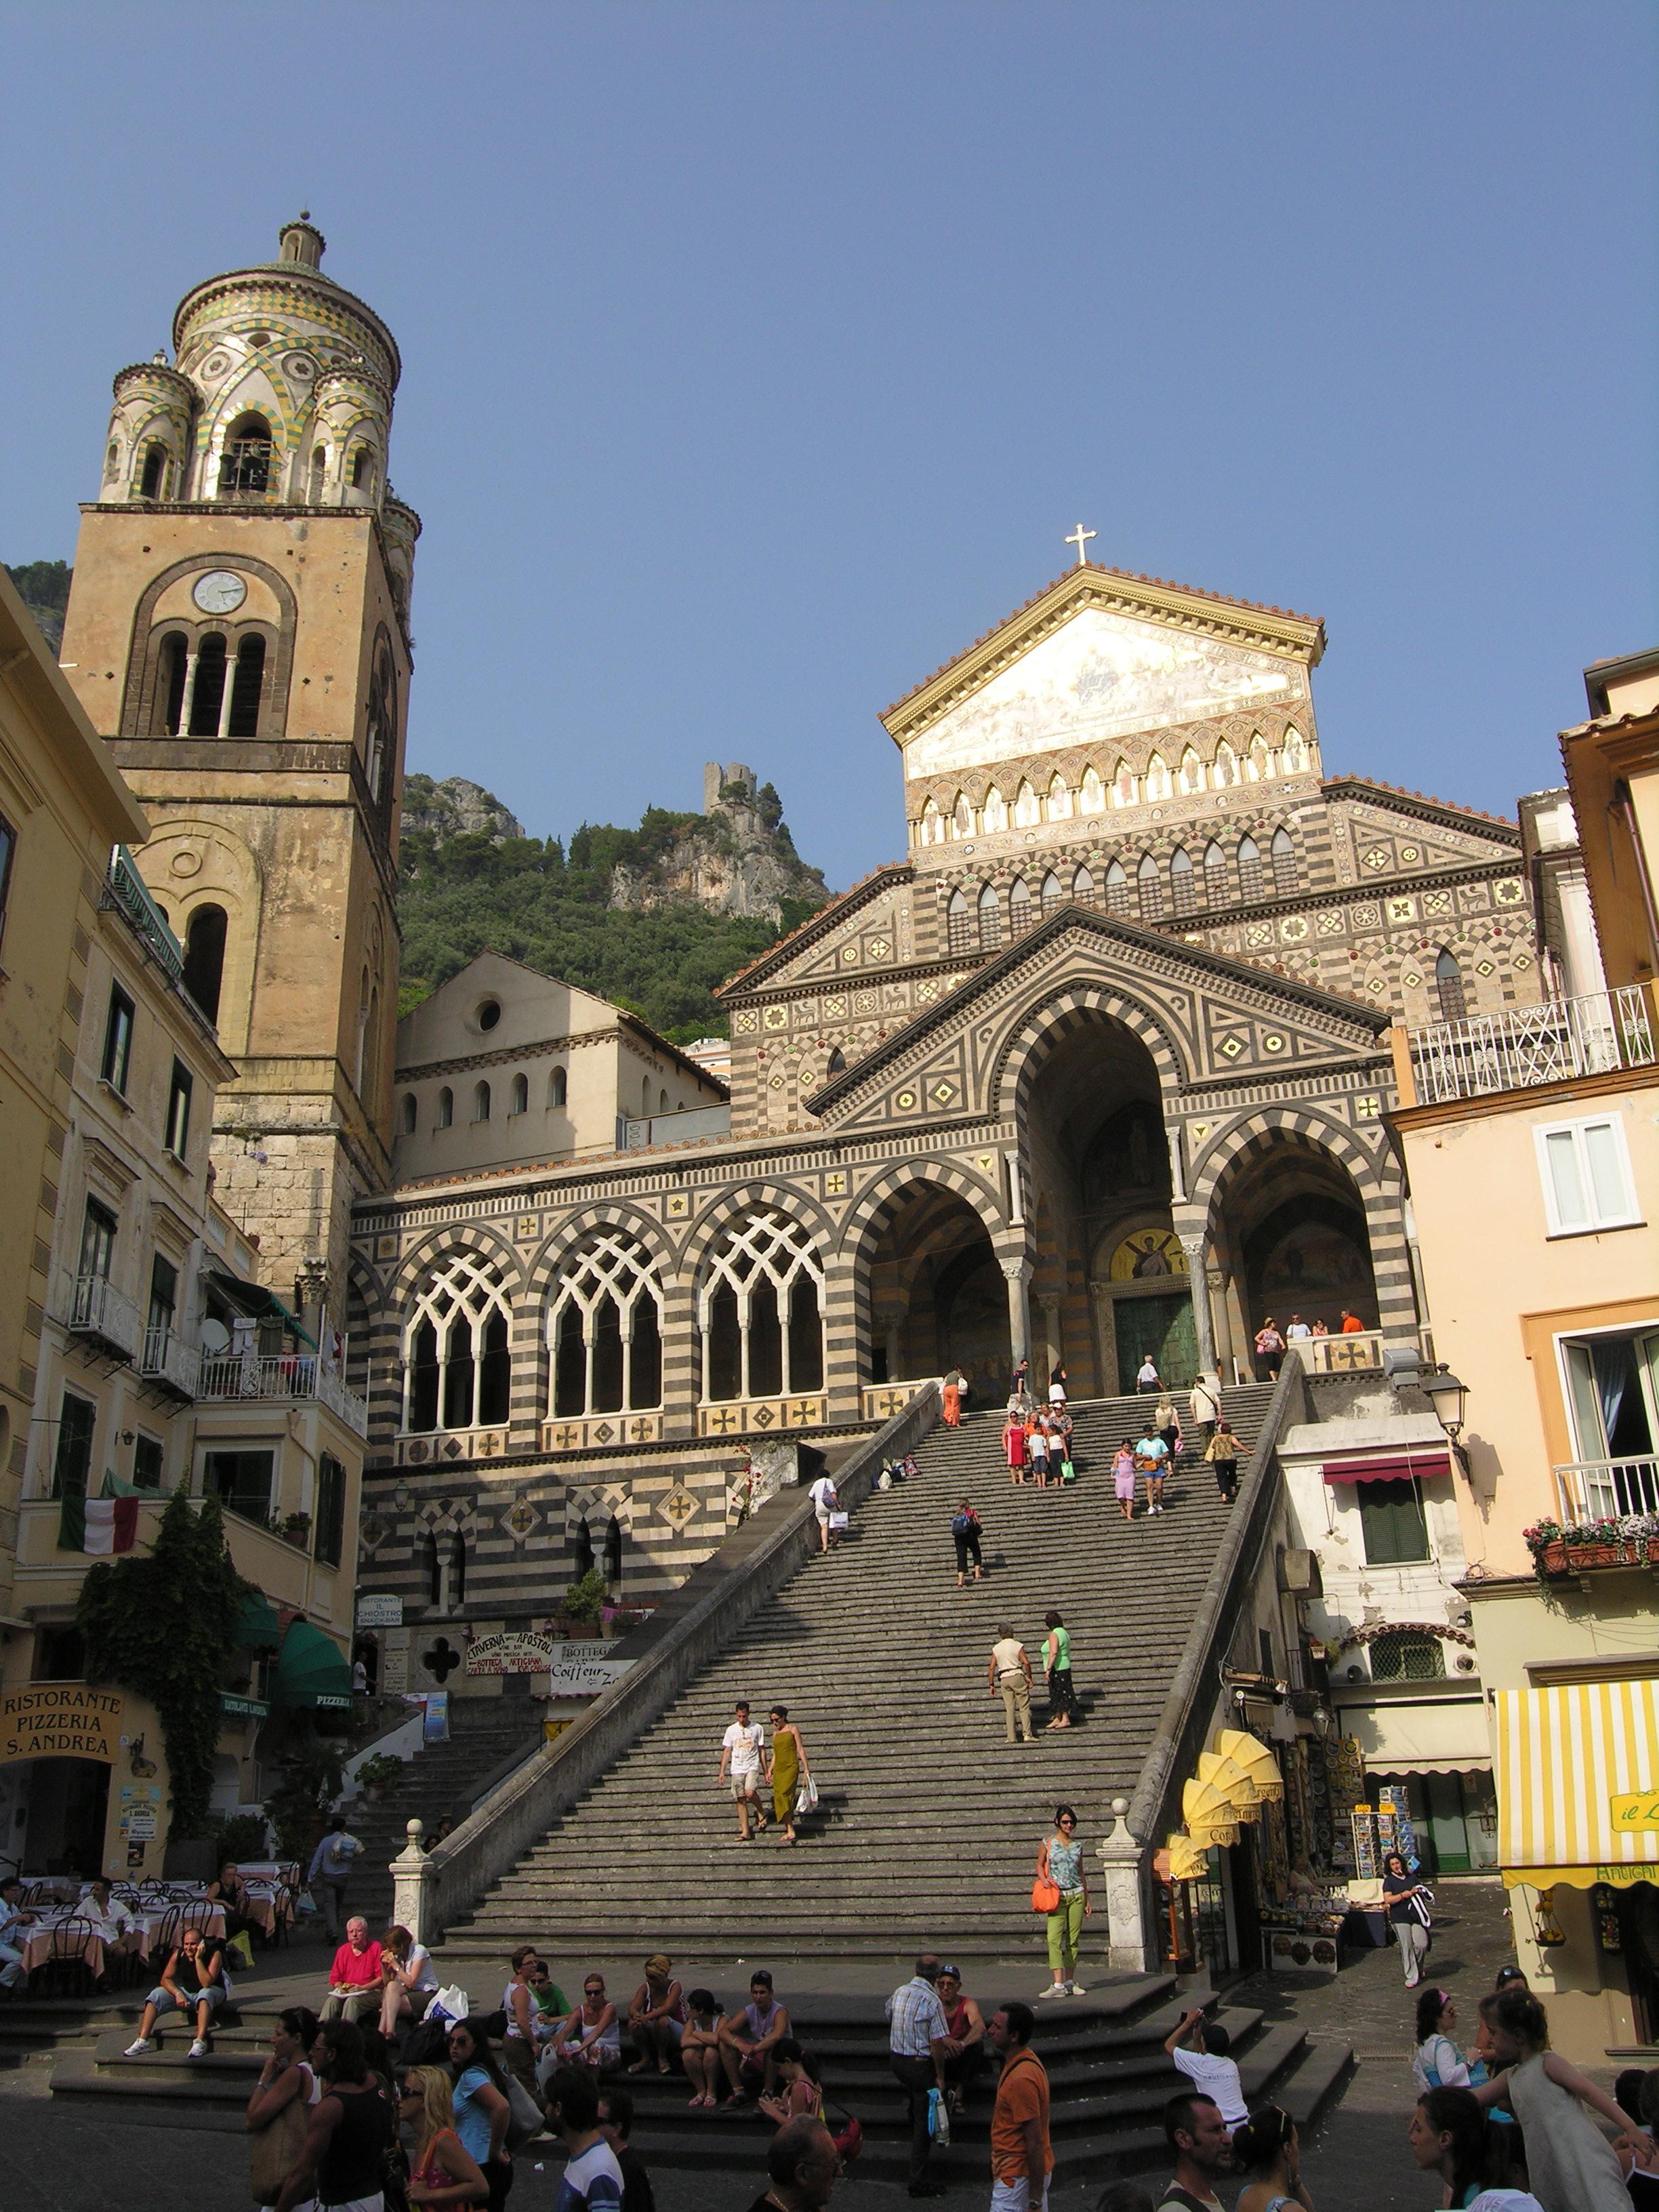 http://upload.wikimedia.org/wikipedia/commons/0/01/Amalfi_Piazza_del_Duomo_Italy_2.JPG